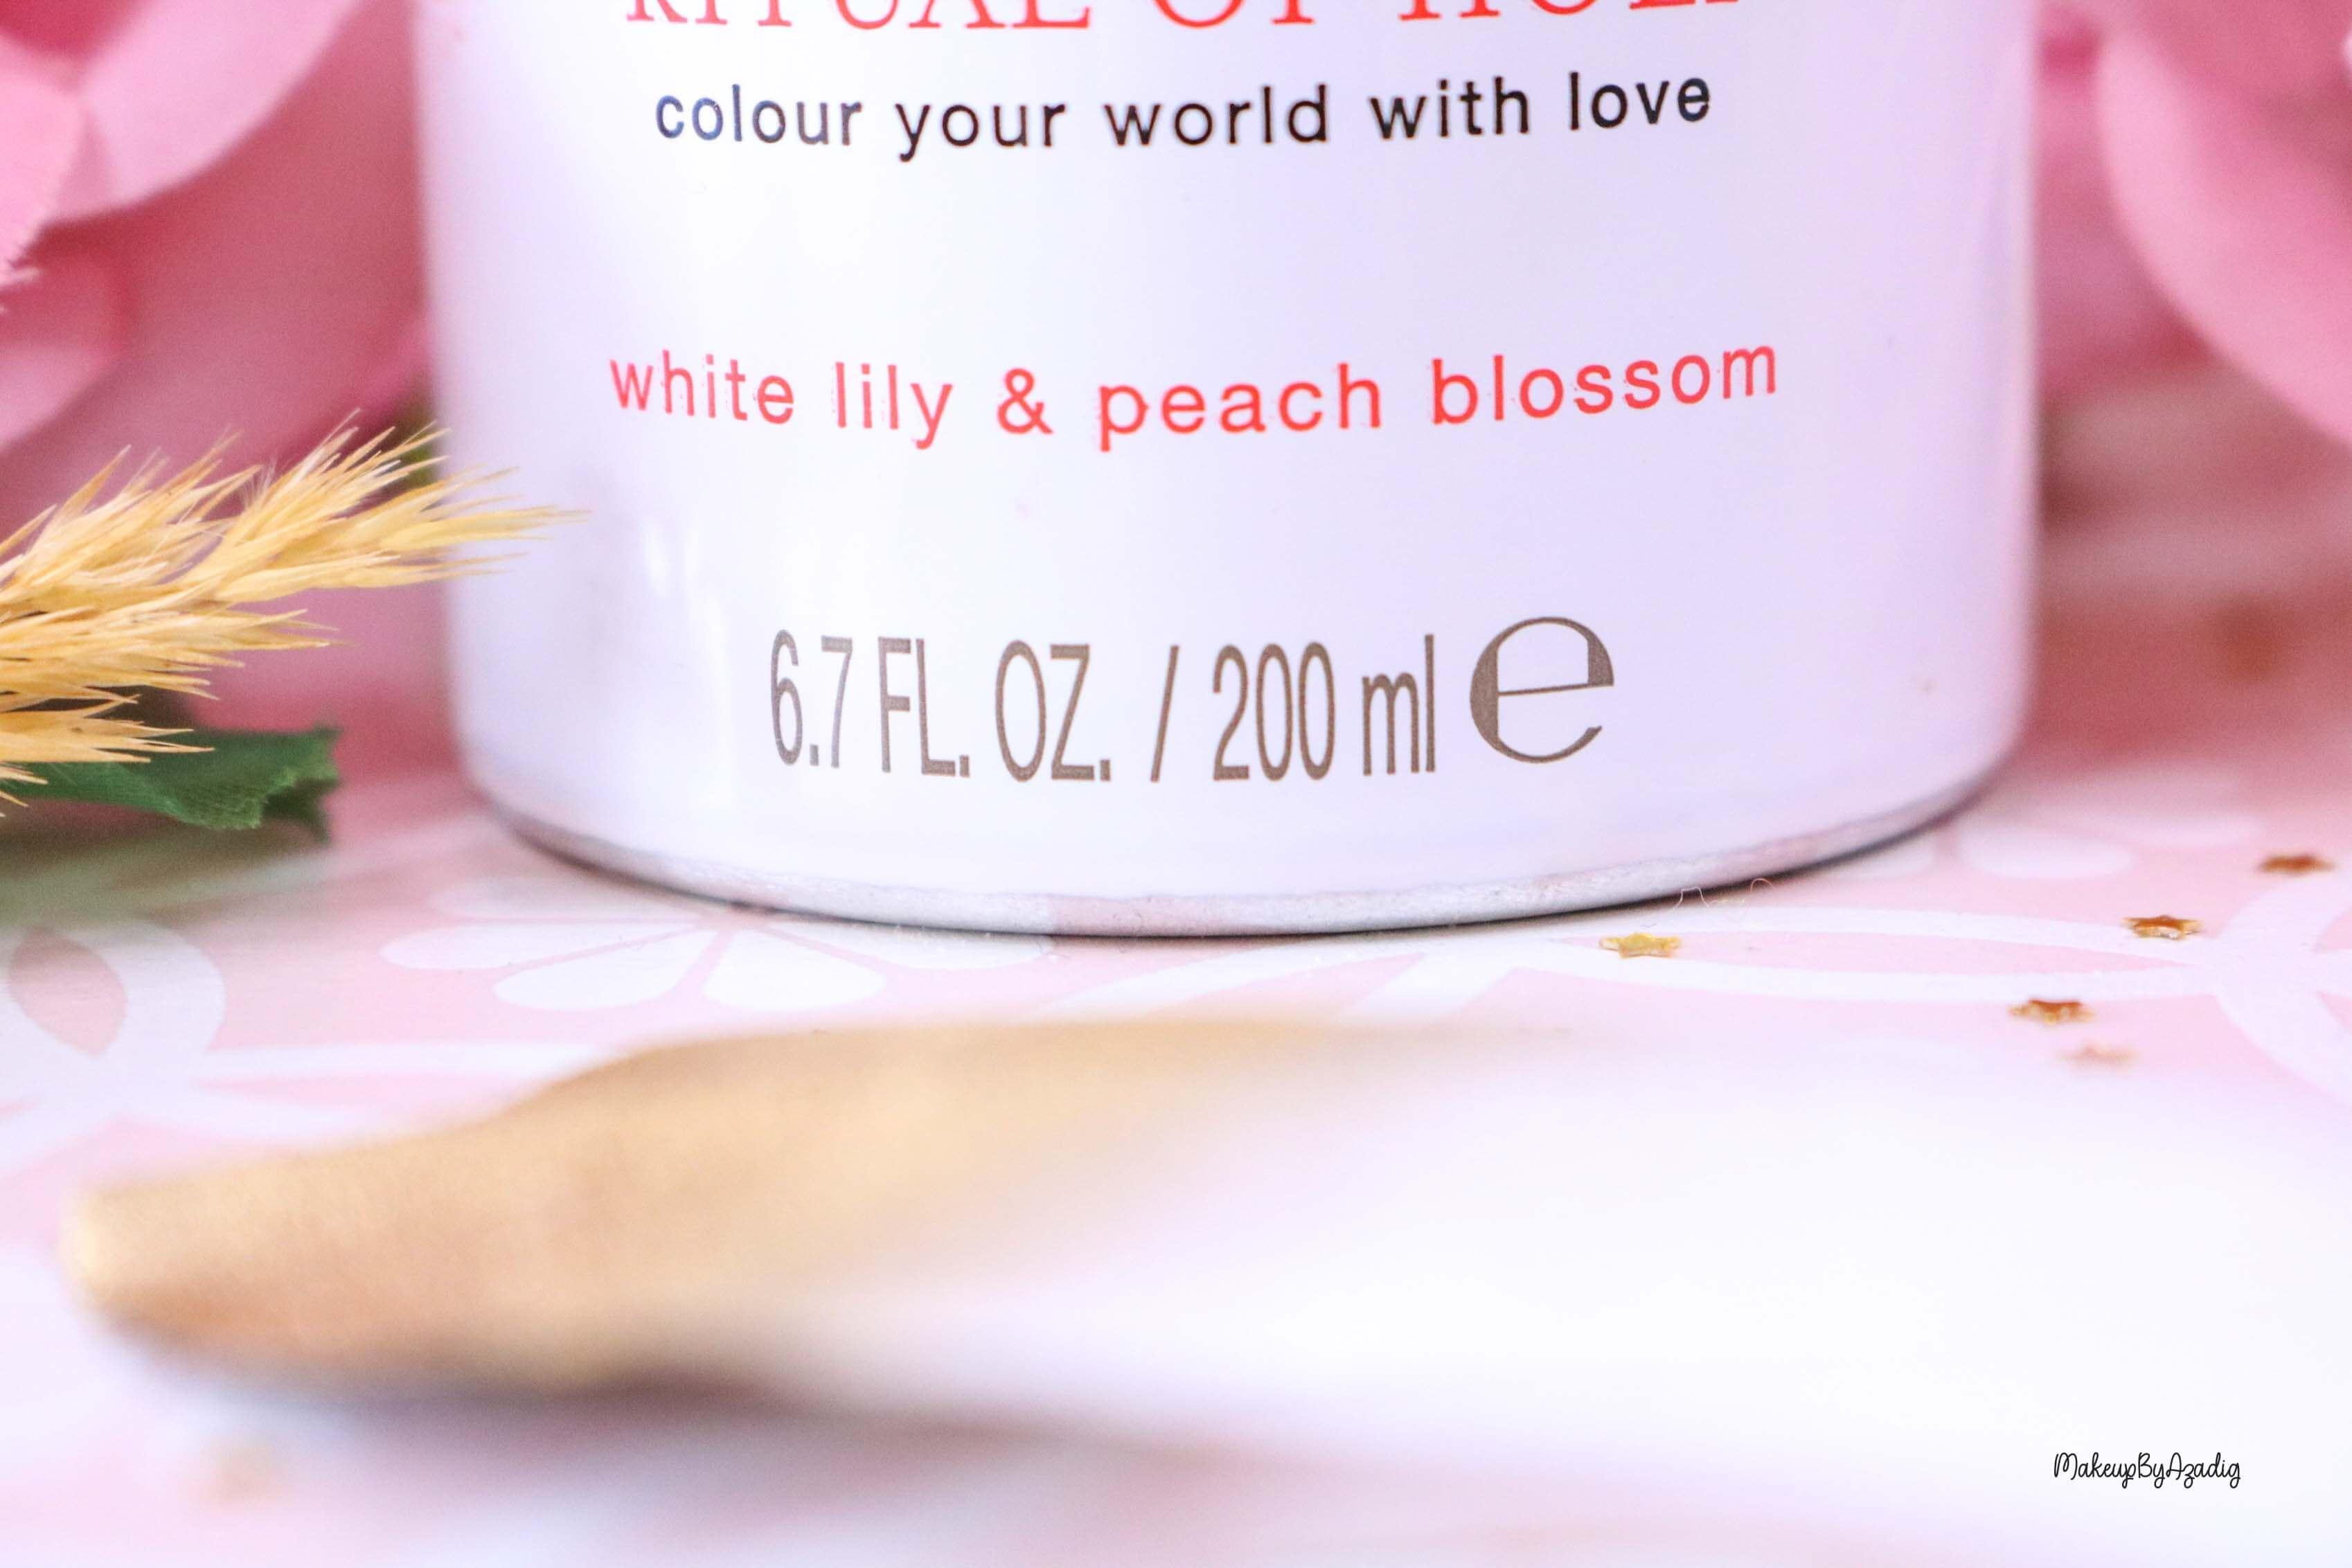 gel-douche-mousse-rituals-shower-flower-foam-ritual-hoi-makeupbyazadig-avis-prix-sephora-france-quantite